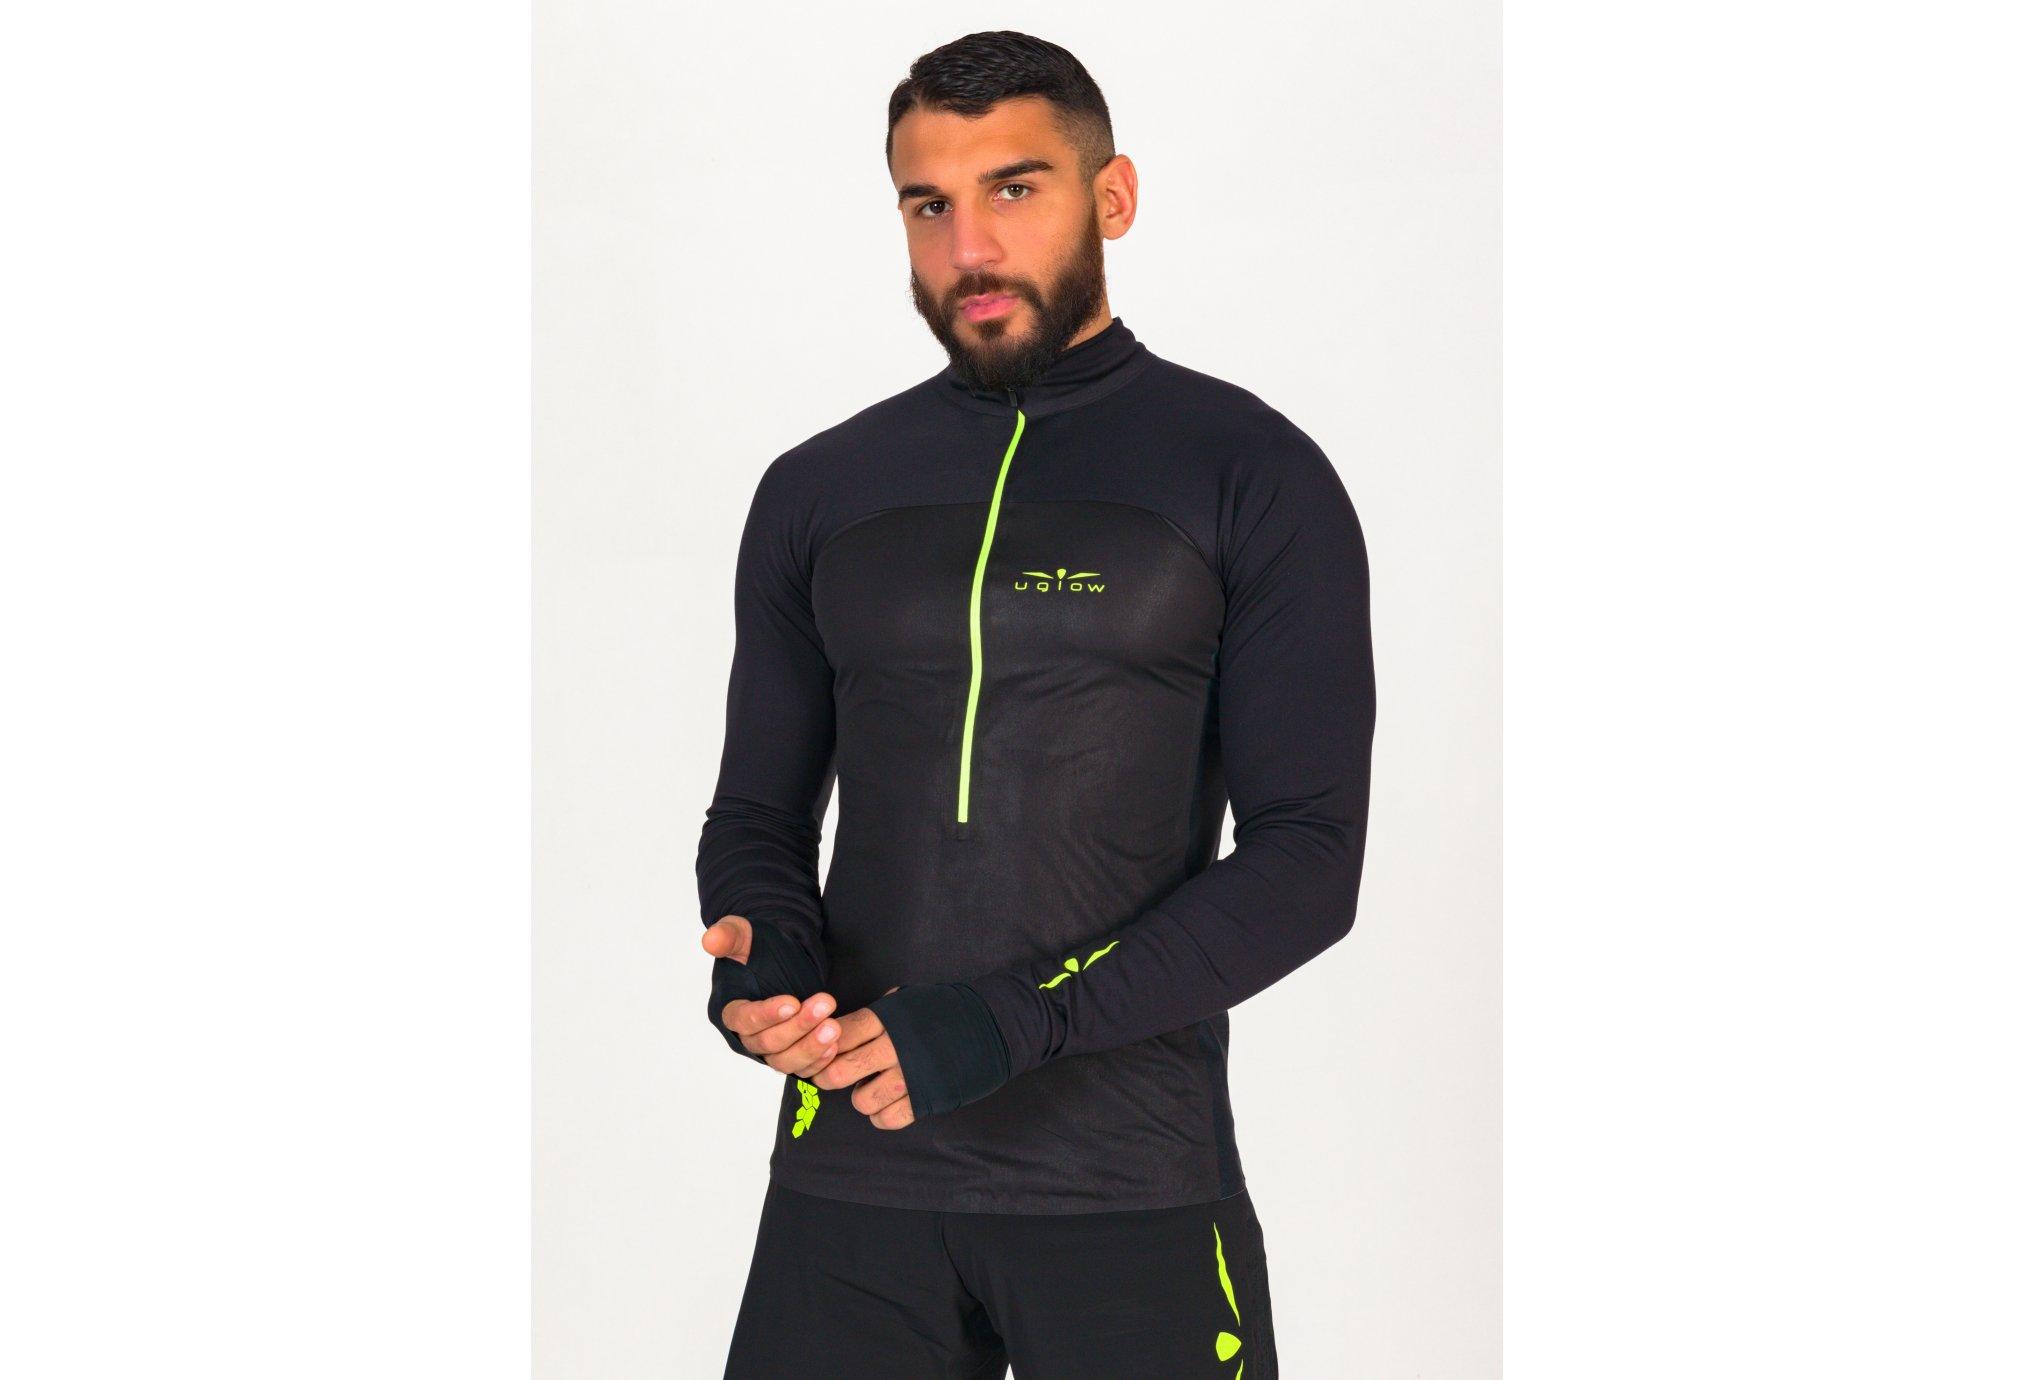 Uglow Membrane 3/4 Zip M vêtement running homme